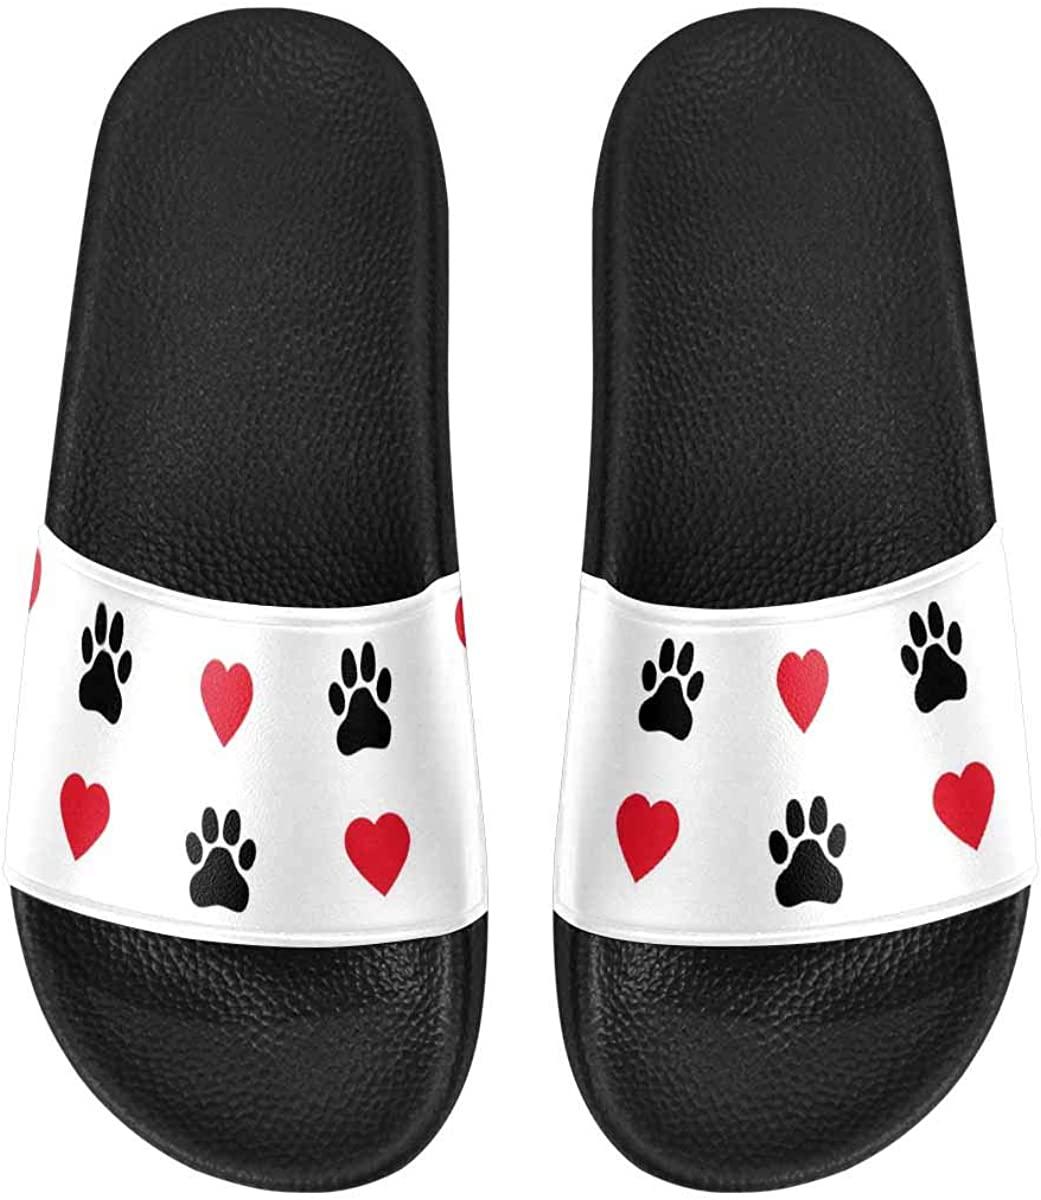 INTERESTPRINT Dog Paw, Cat Paw, Heart Men's Sandals, Shoes for Men Shower Beach Slide Sandals